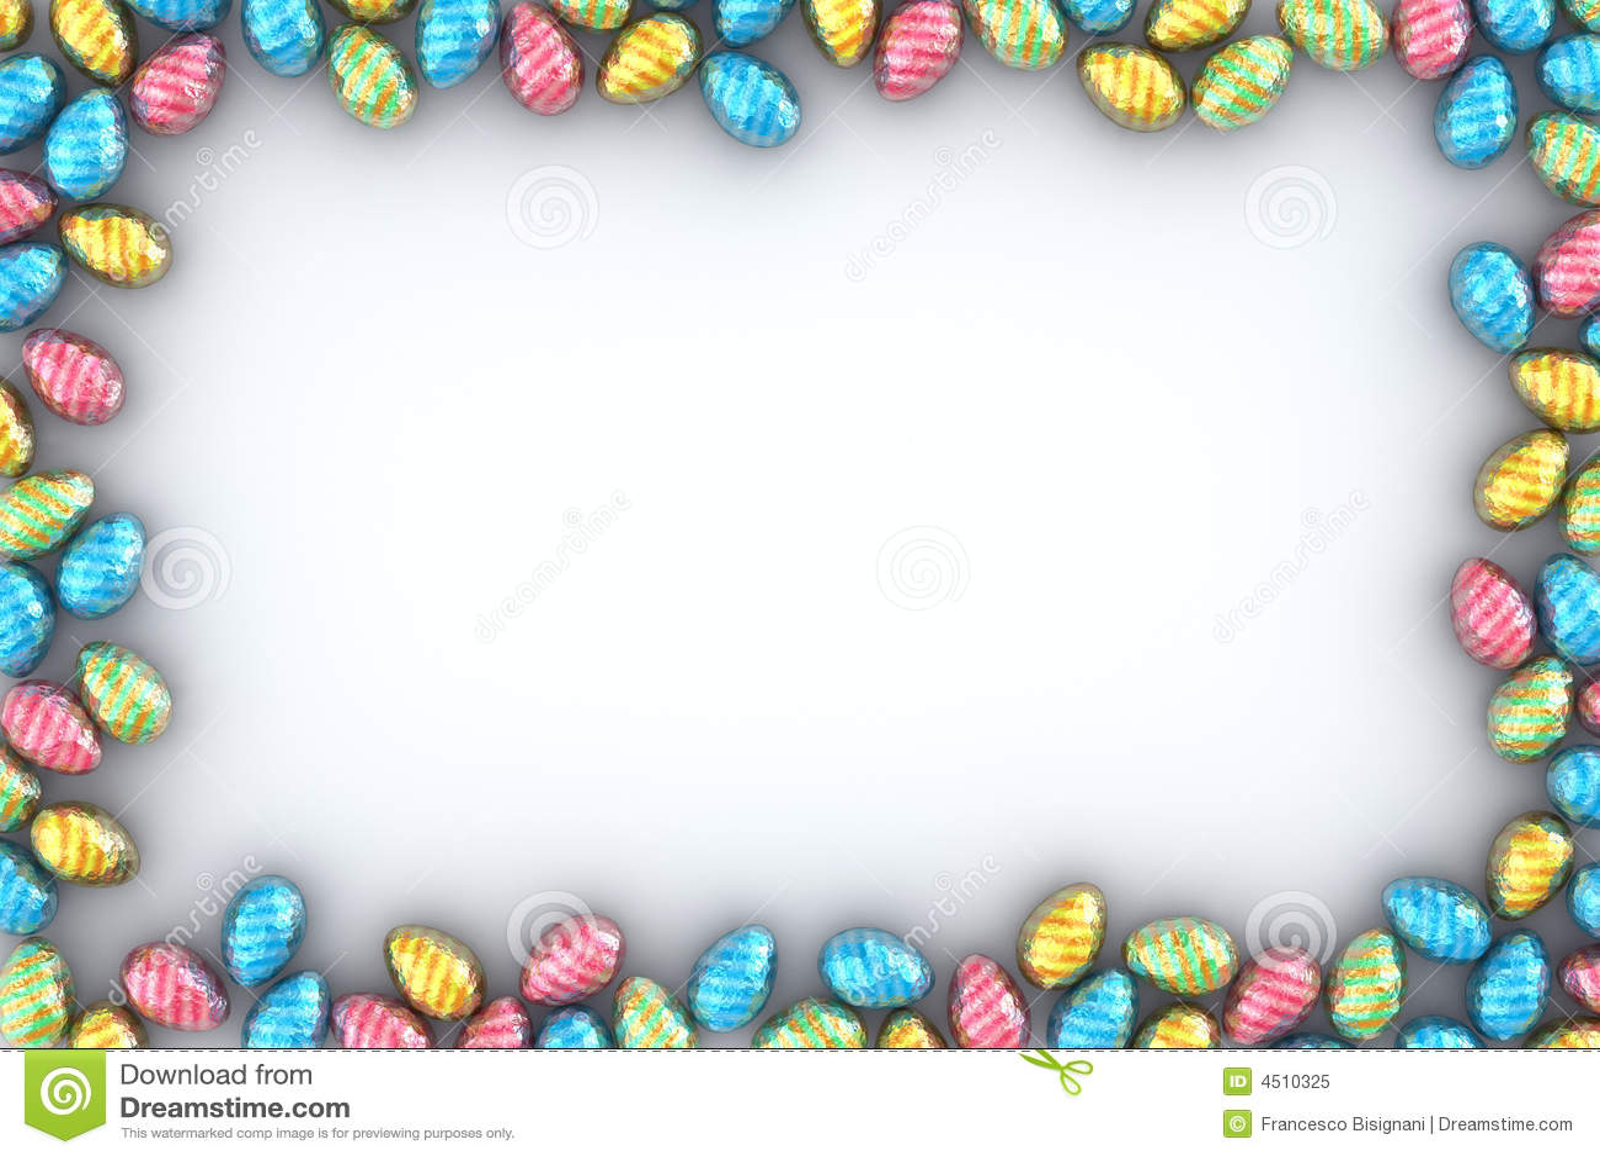 Easter Eggs Frame Royalty Free Stock Photo